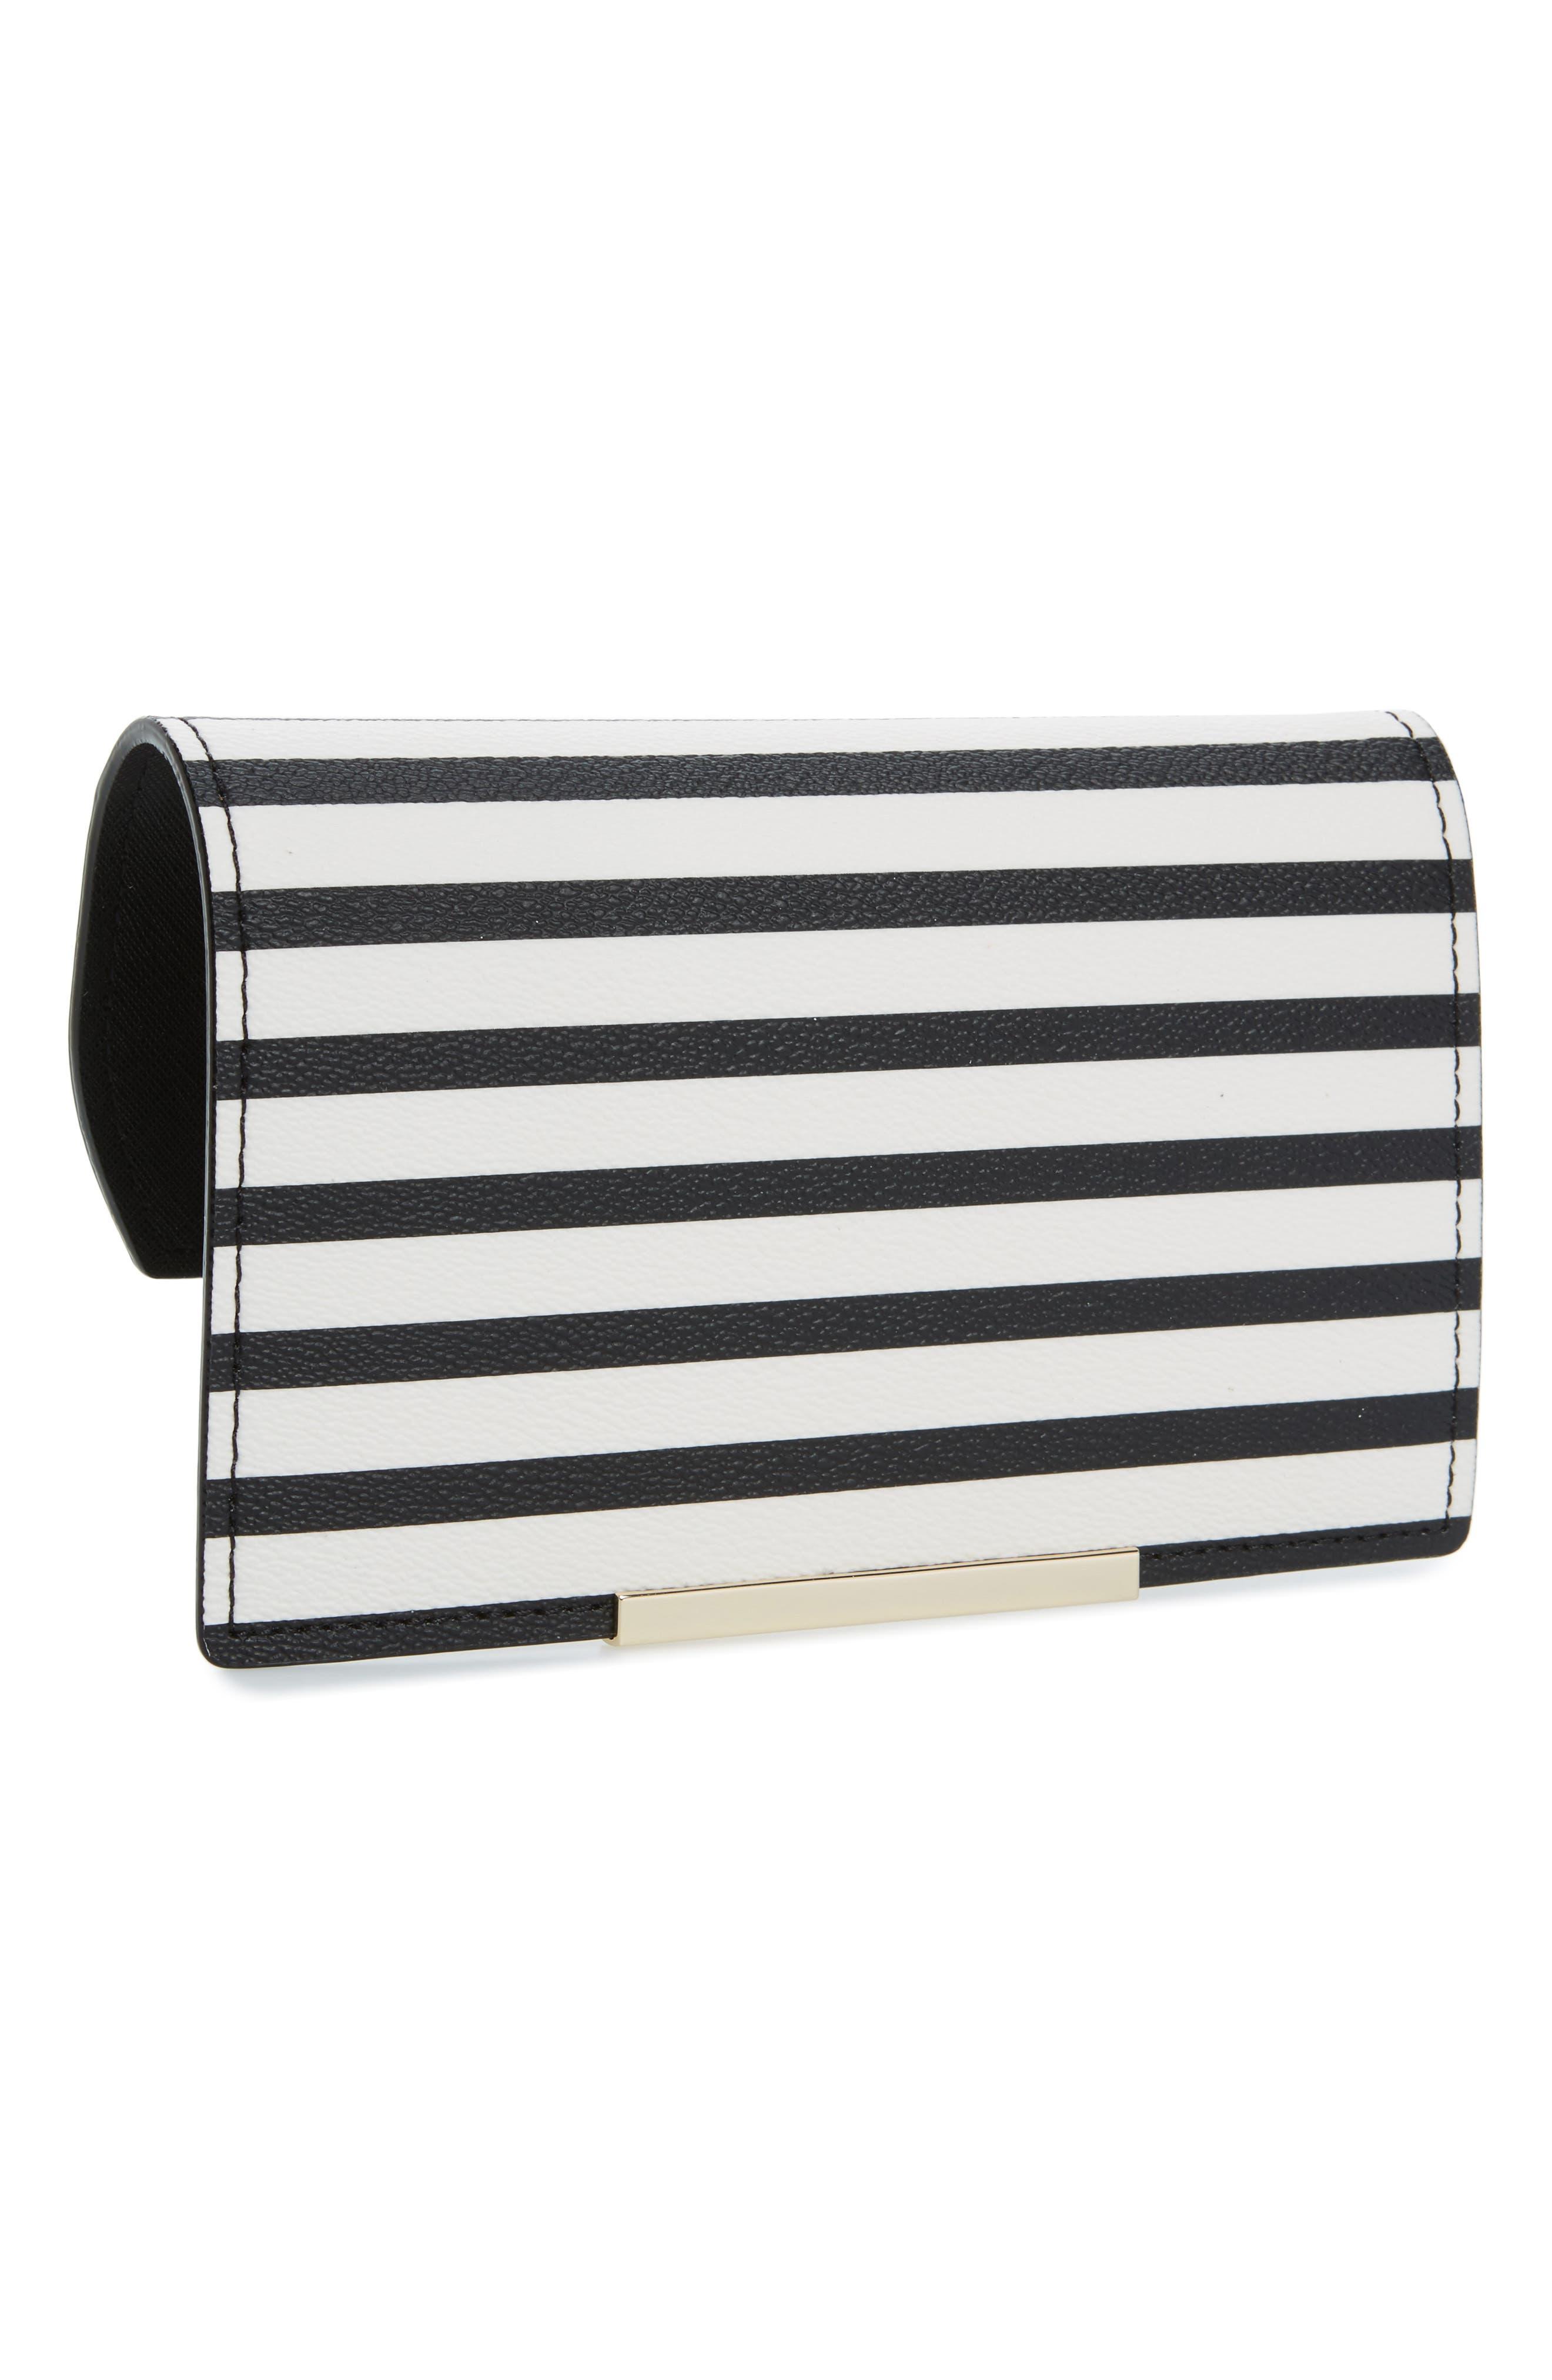 make it mine stripe snap-on accent flap,                             Main thumbnail 1, color,                             Cement/ Black